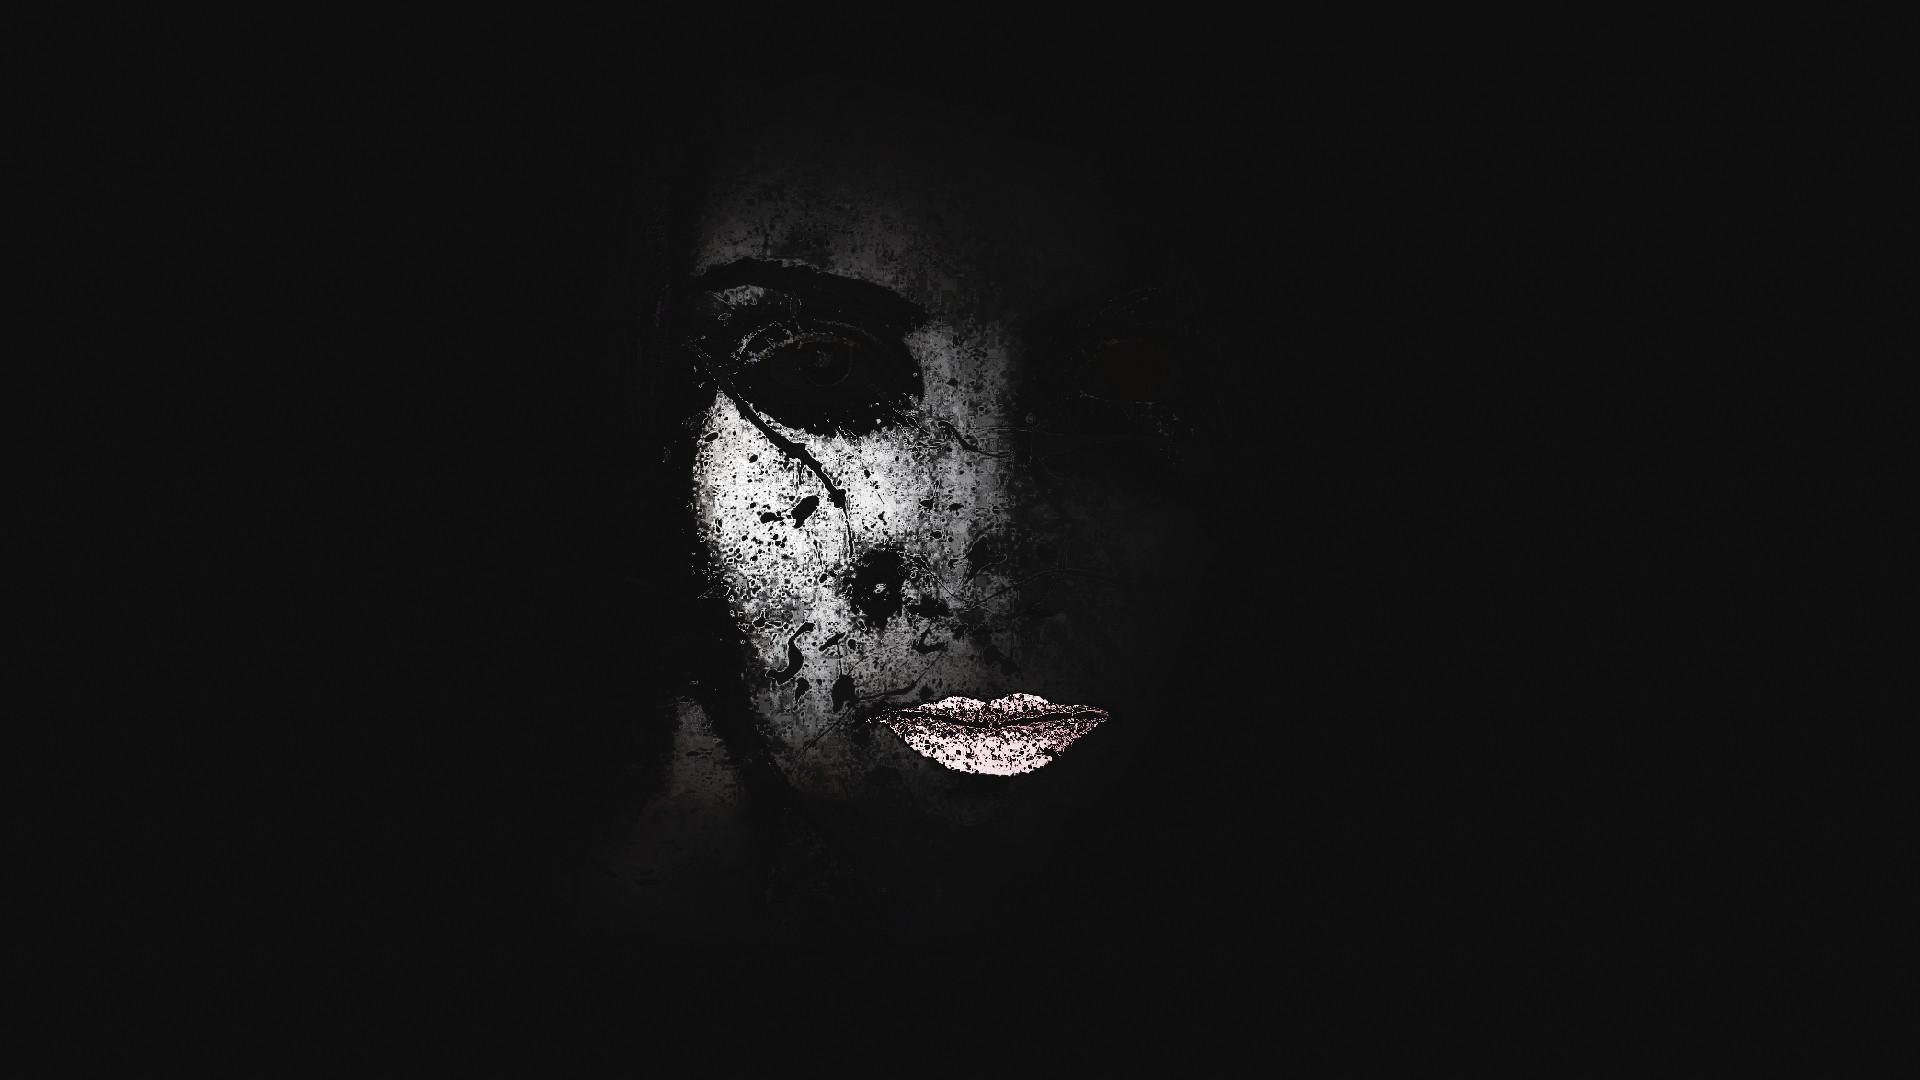 General 1920x1080 women pink lipstick dark face